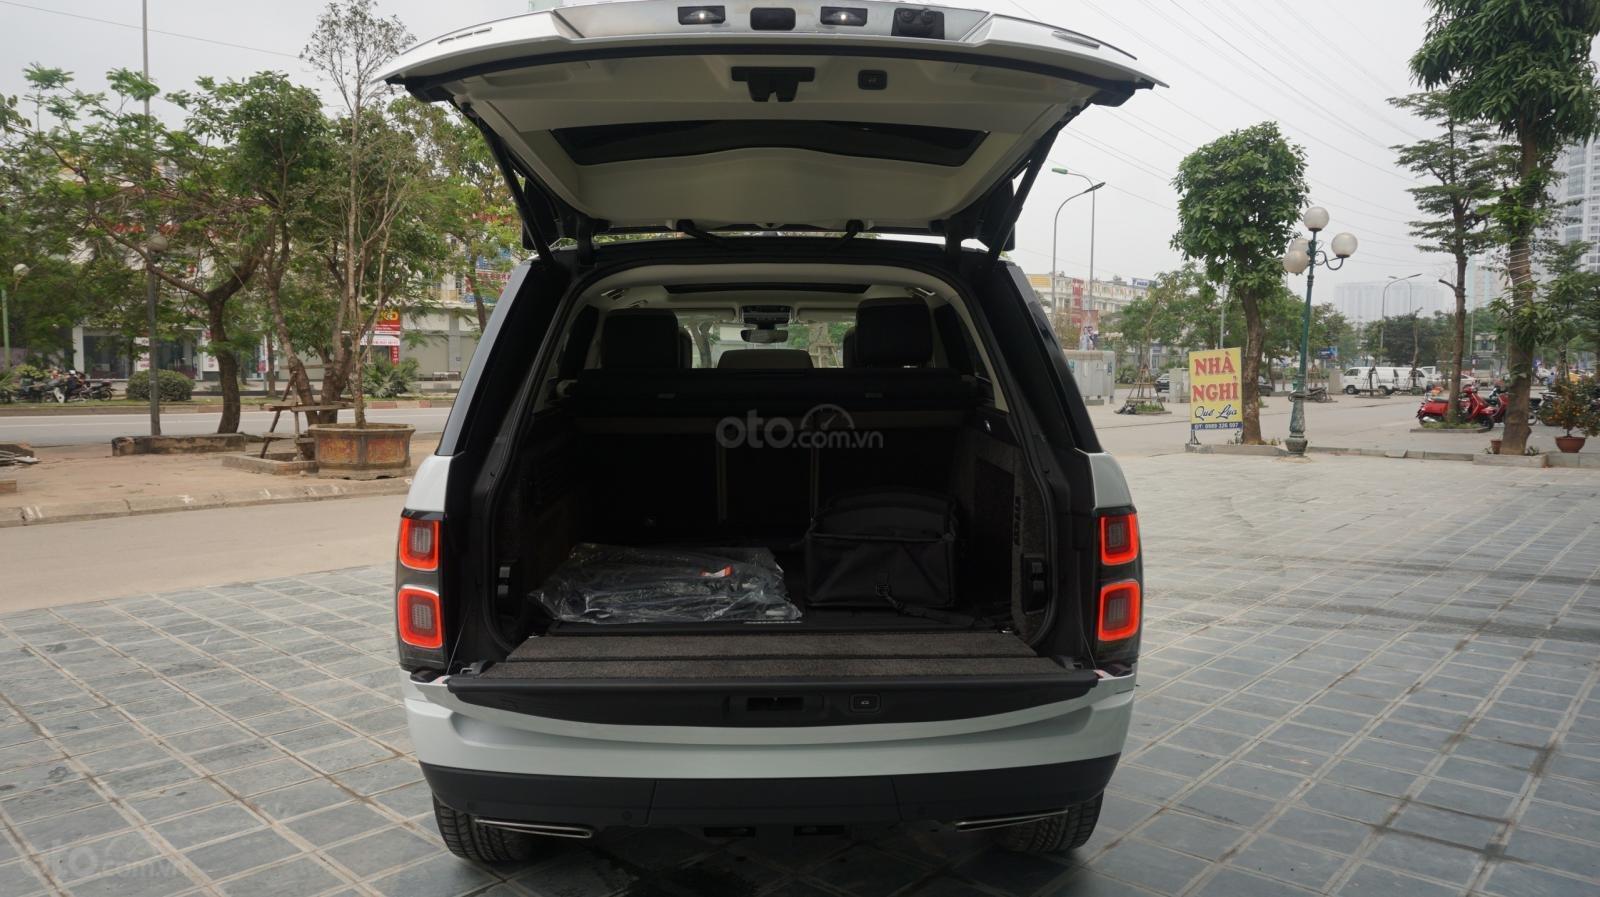 Cần bán xe LandRover Range Rover HSE năm 2019, màu trắng, xe nhập-13